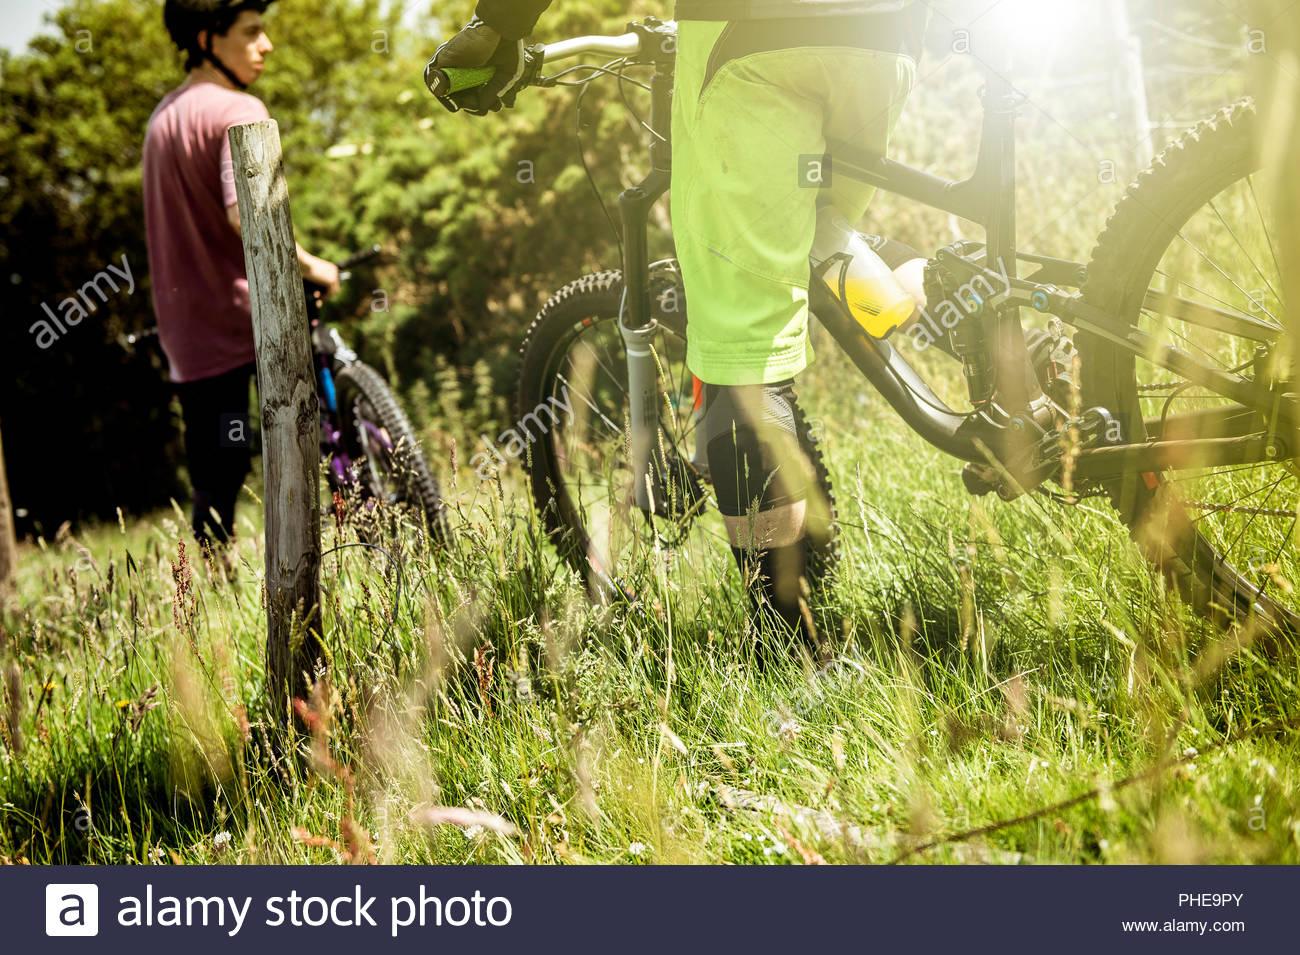 Los hombres en bicicletas de montaña en Porlock Weir, Inglaterra Imagen De Stock